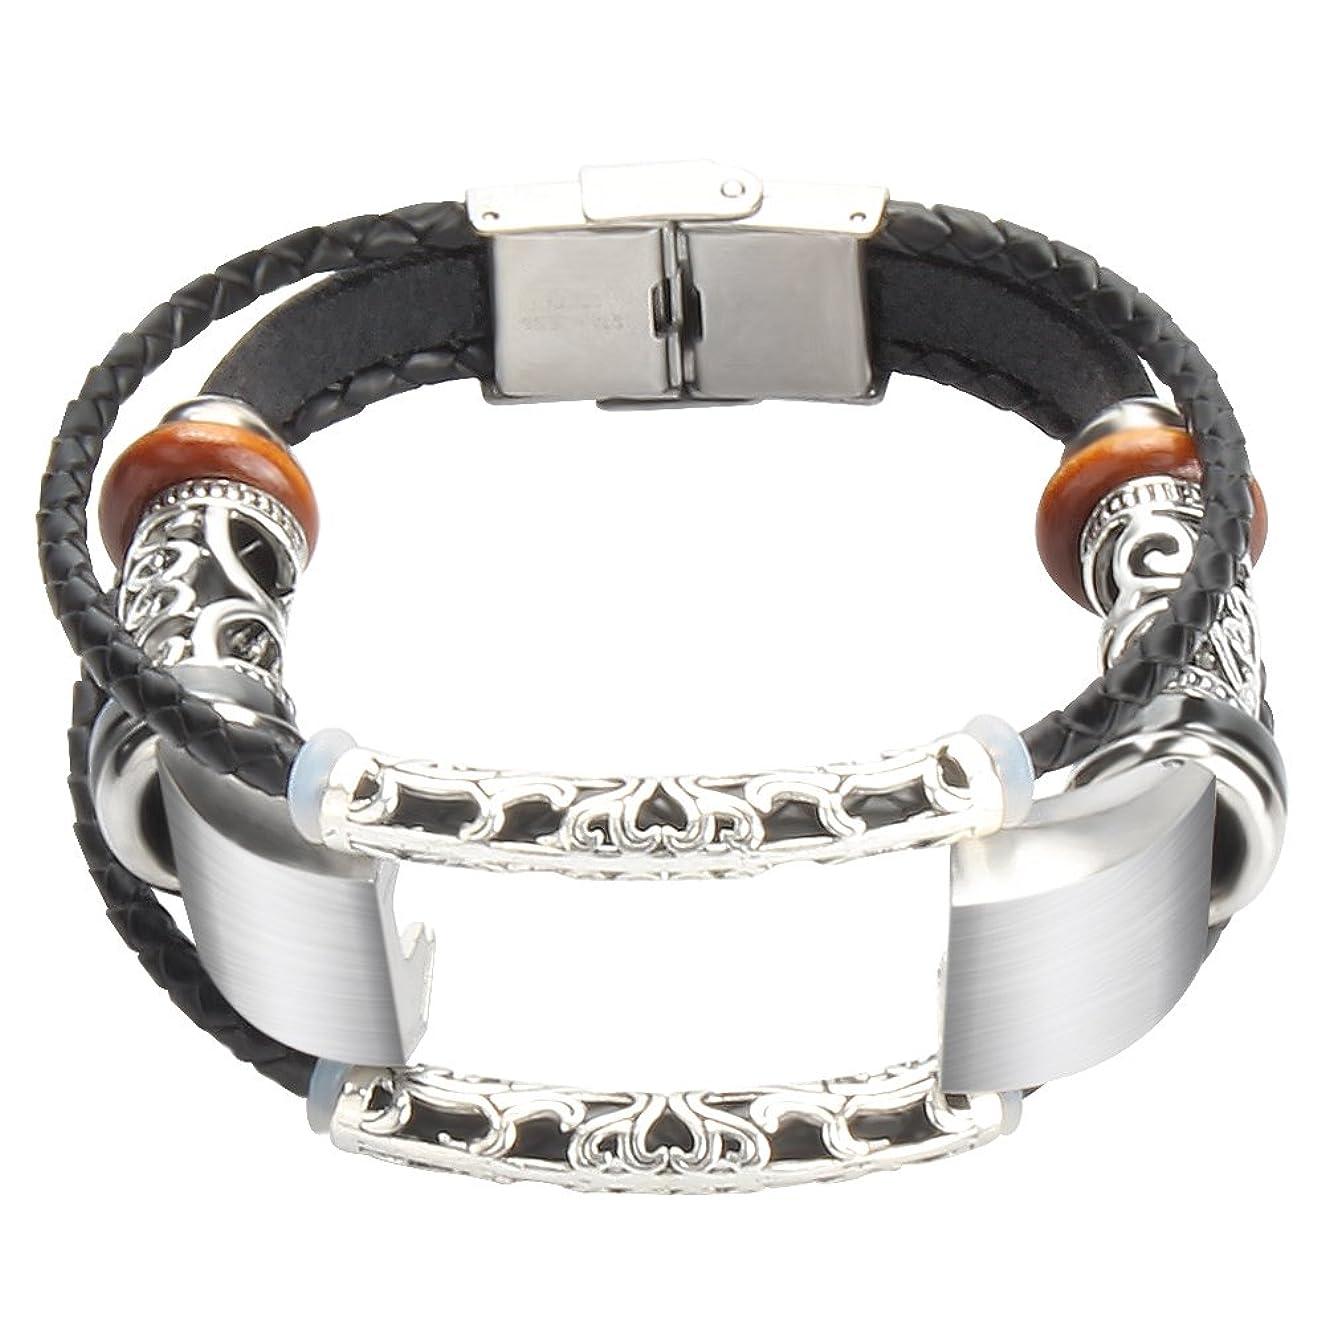 somoder Leather Bands Compatible Fitbit Alta HR & Fitbit Alta, Handmade Vintage Fashion Alloy Leather Bracelet Replacement Fitbit Alta Bands, Adjustable 5.5